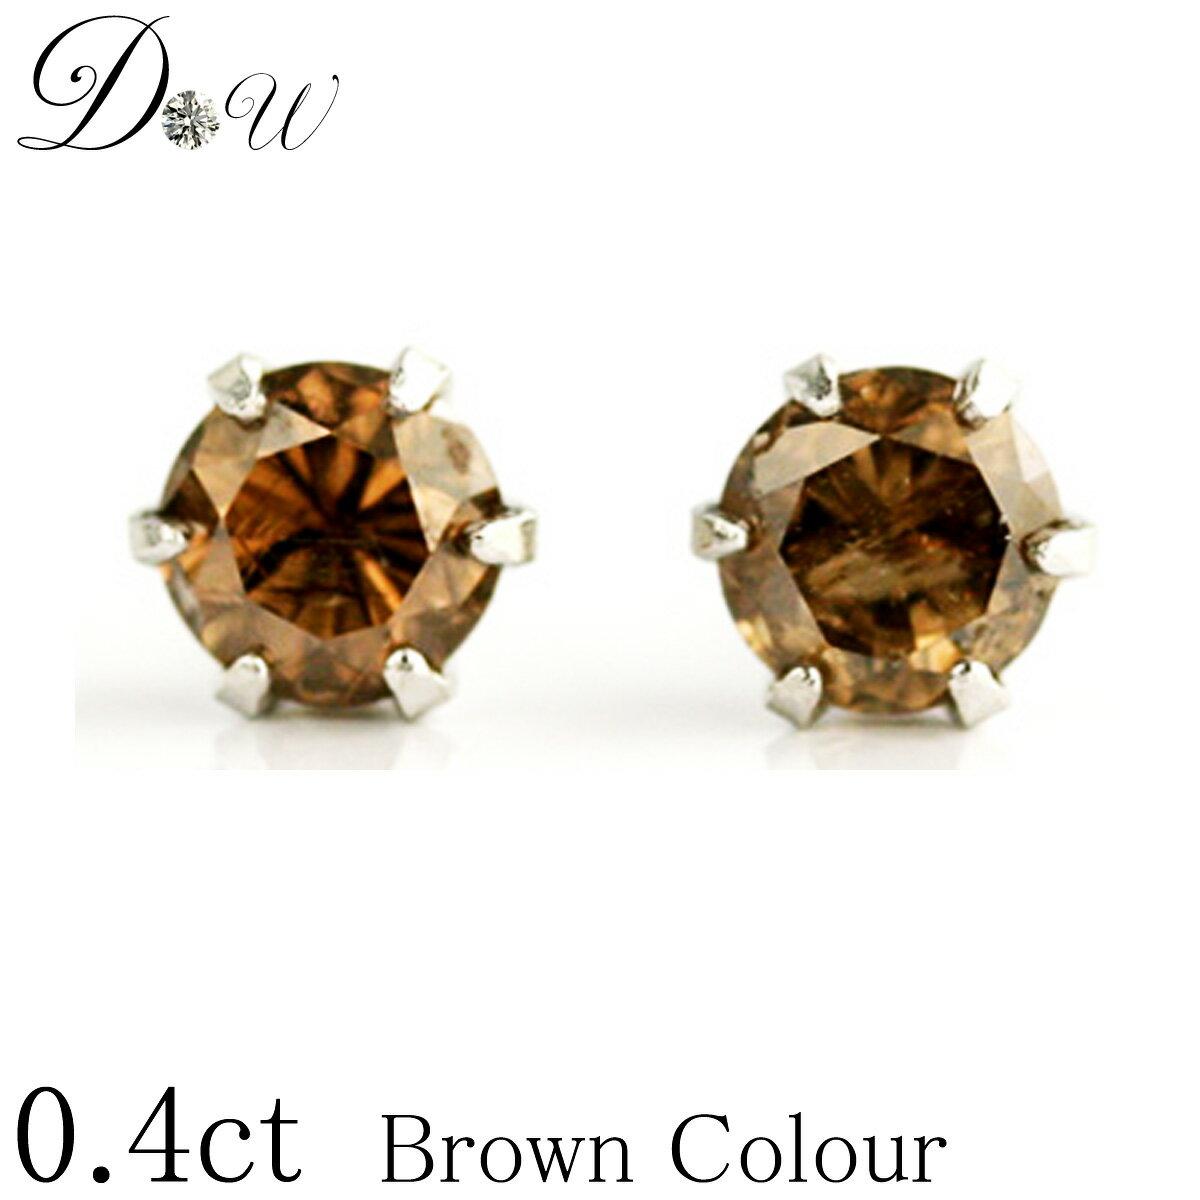 PT900 ダイヤモンド ピアスブラウンカラー 0.40ct 【6本爪タイプ】【品質保証書付】天然ダイヤモンド【 輝き厳選保証 】【即日発送可】